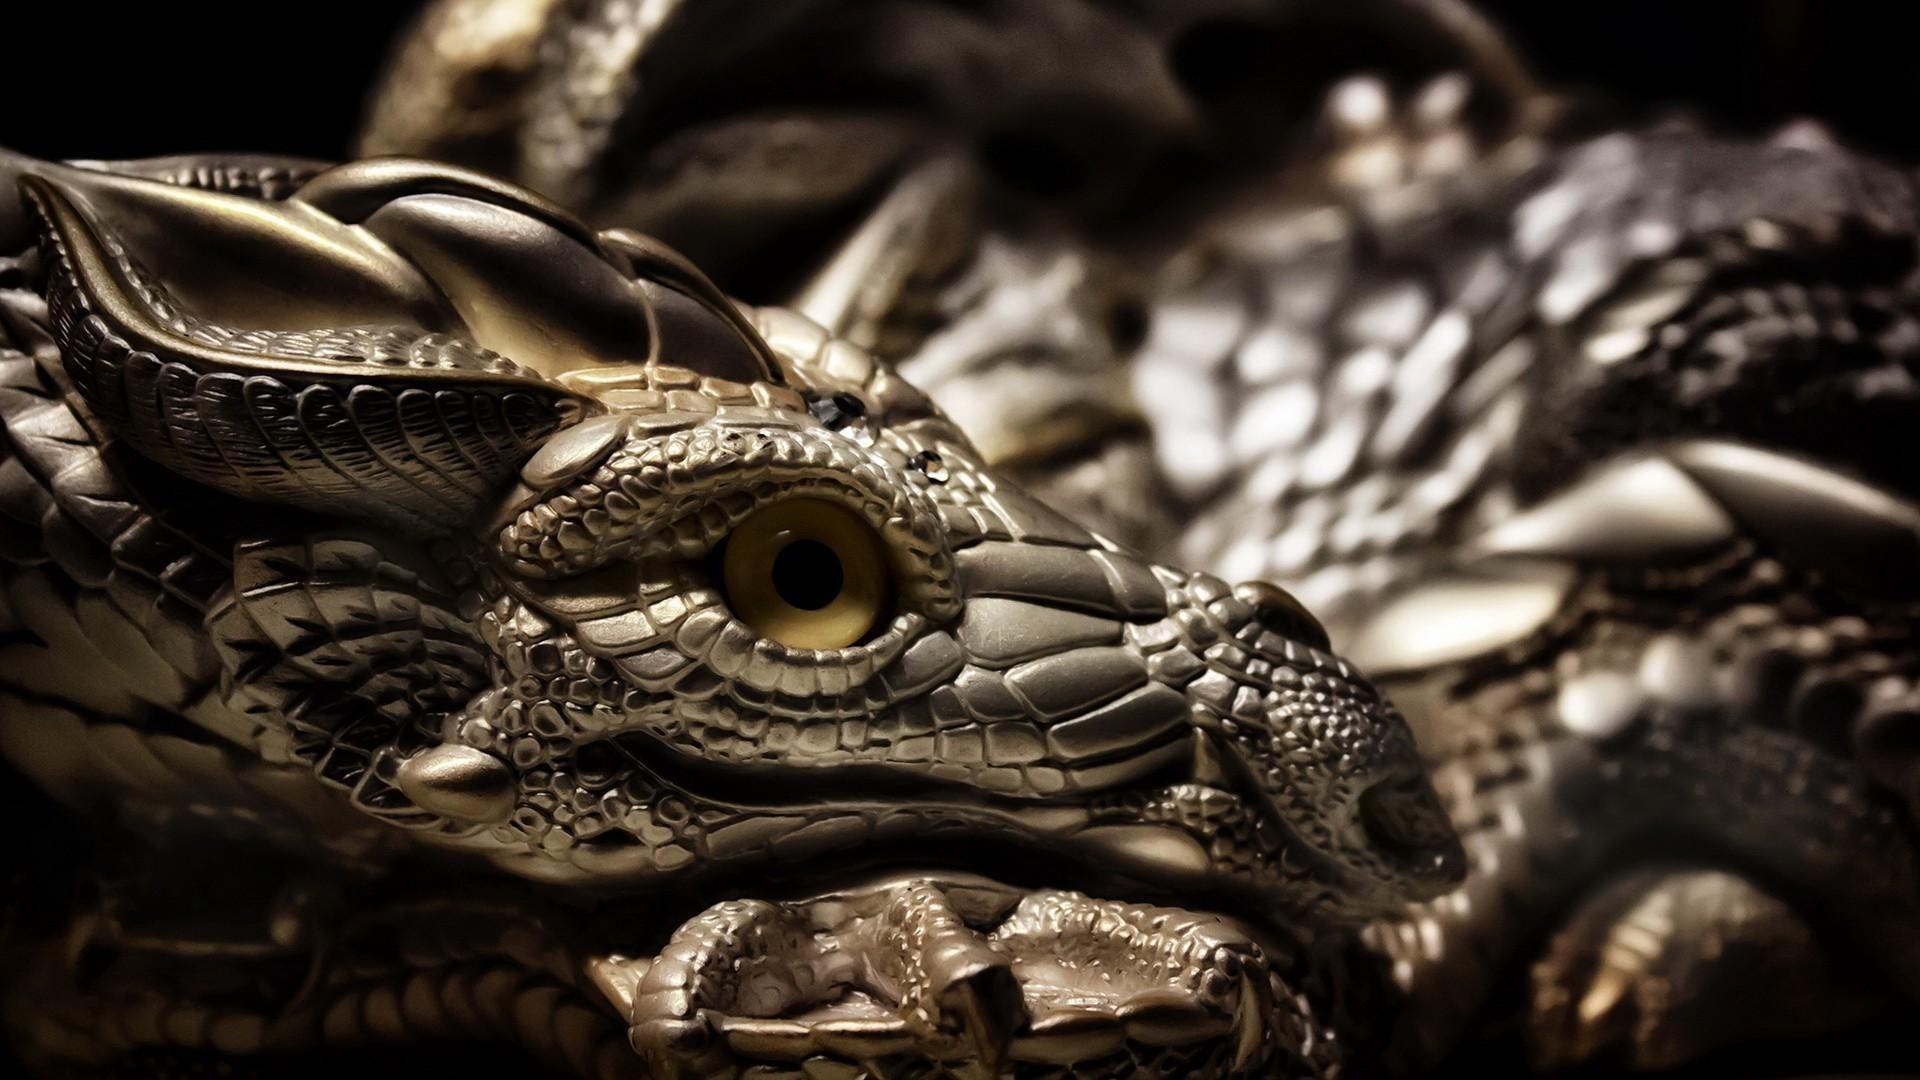 dragon 3d printer model wallpaper